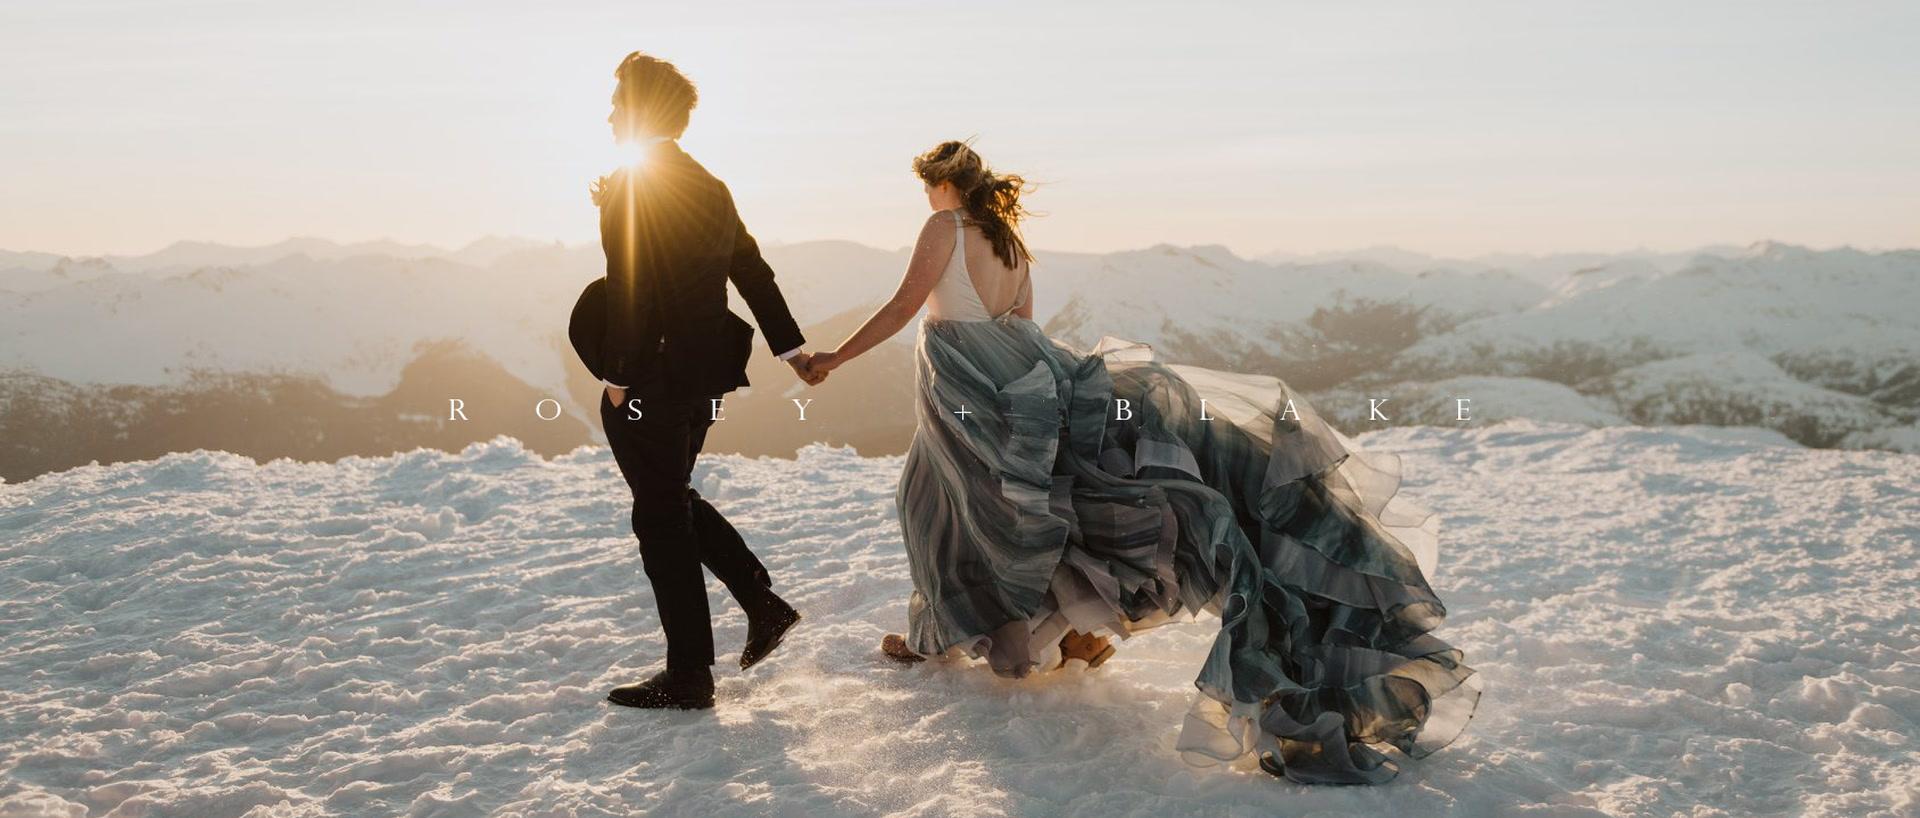 Rosey + Blake   Whistler, Canada   fairmont chateau whistler